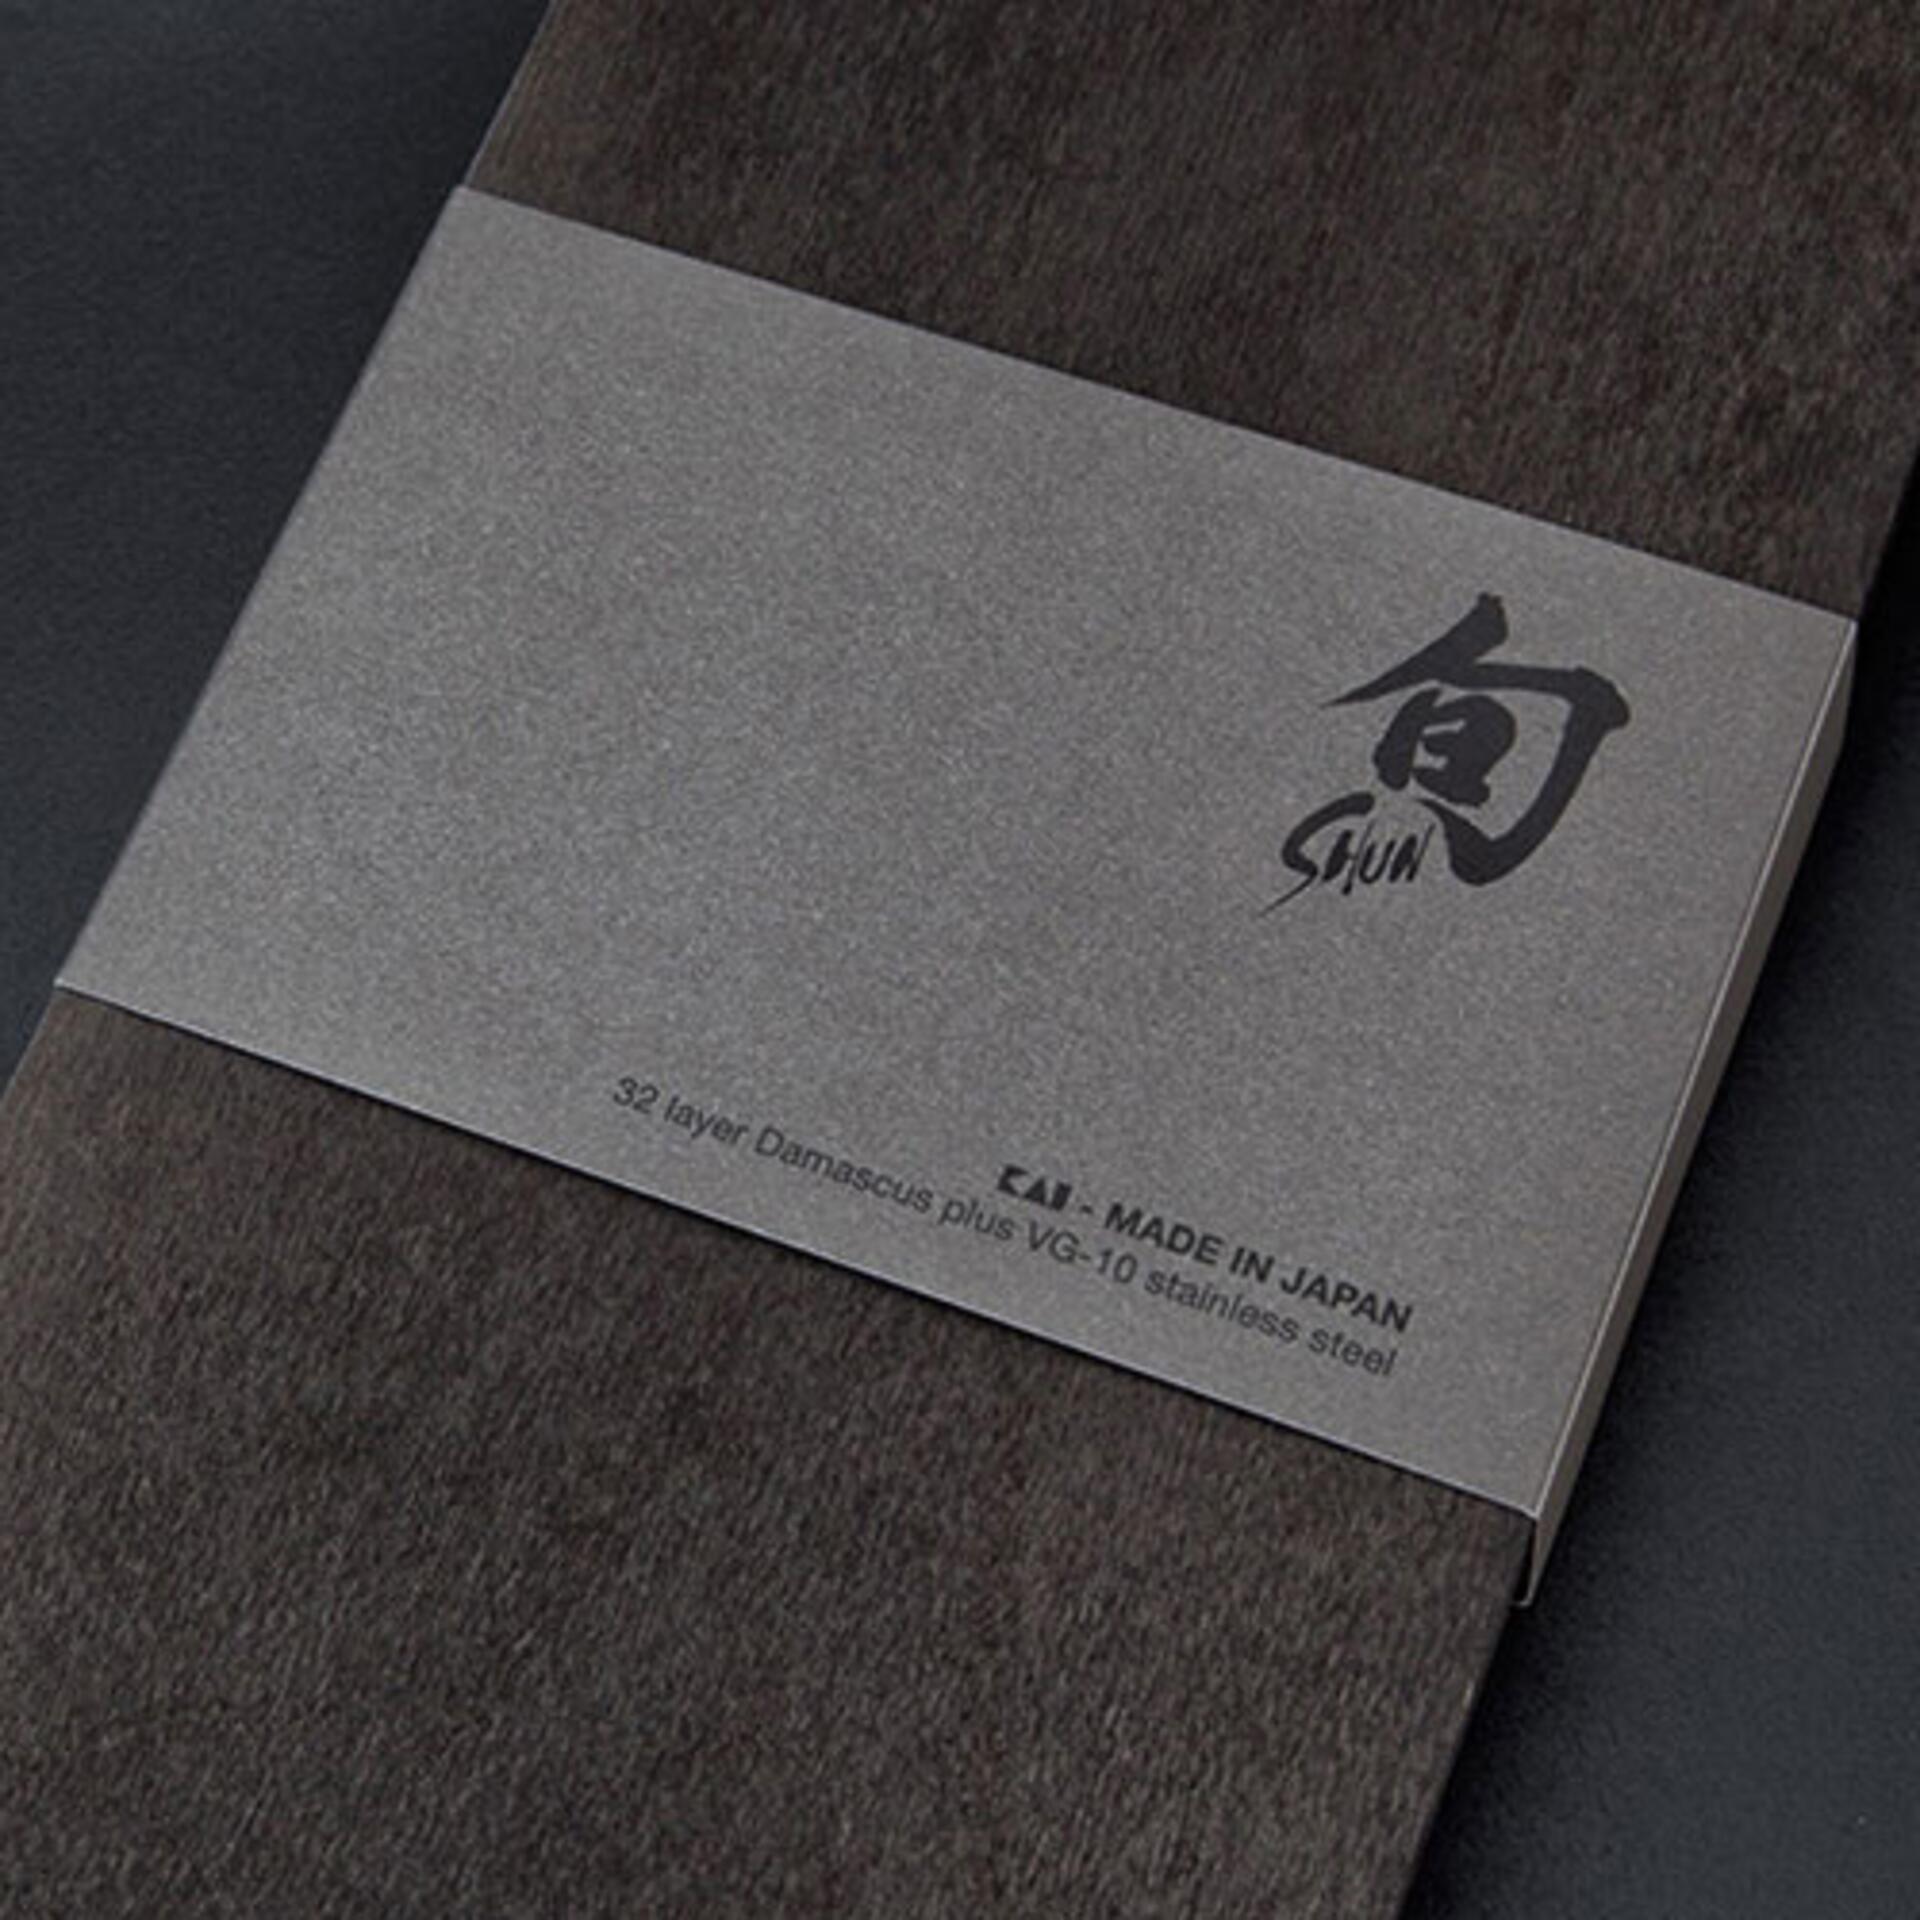 KAI Shun Classic Allzweckmesser DM-0716